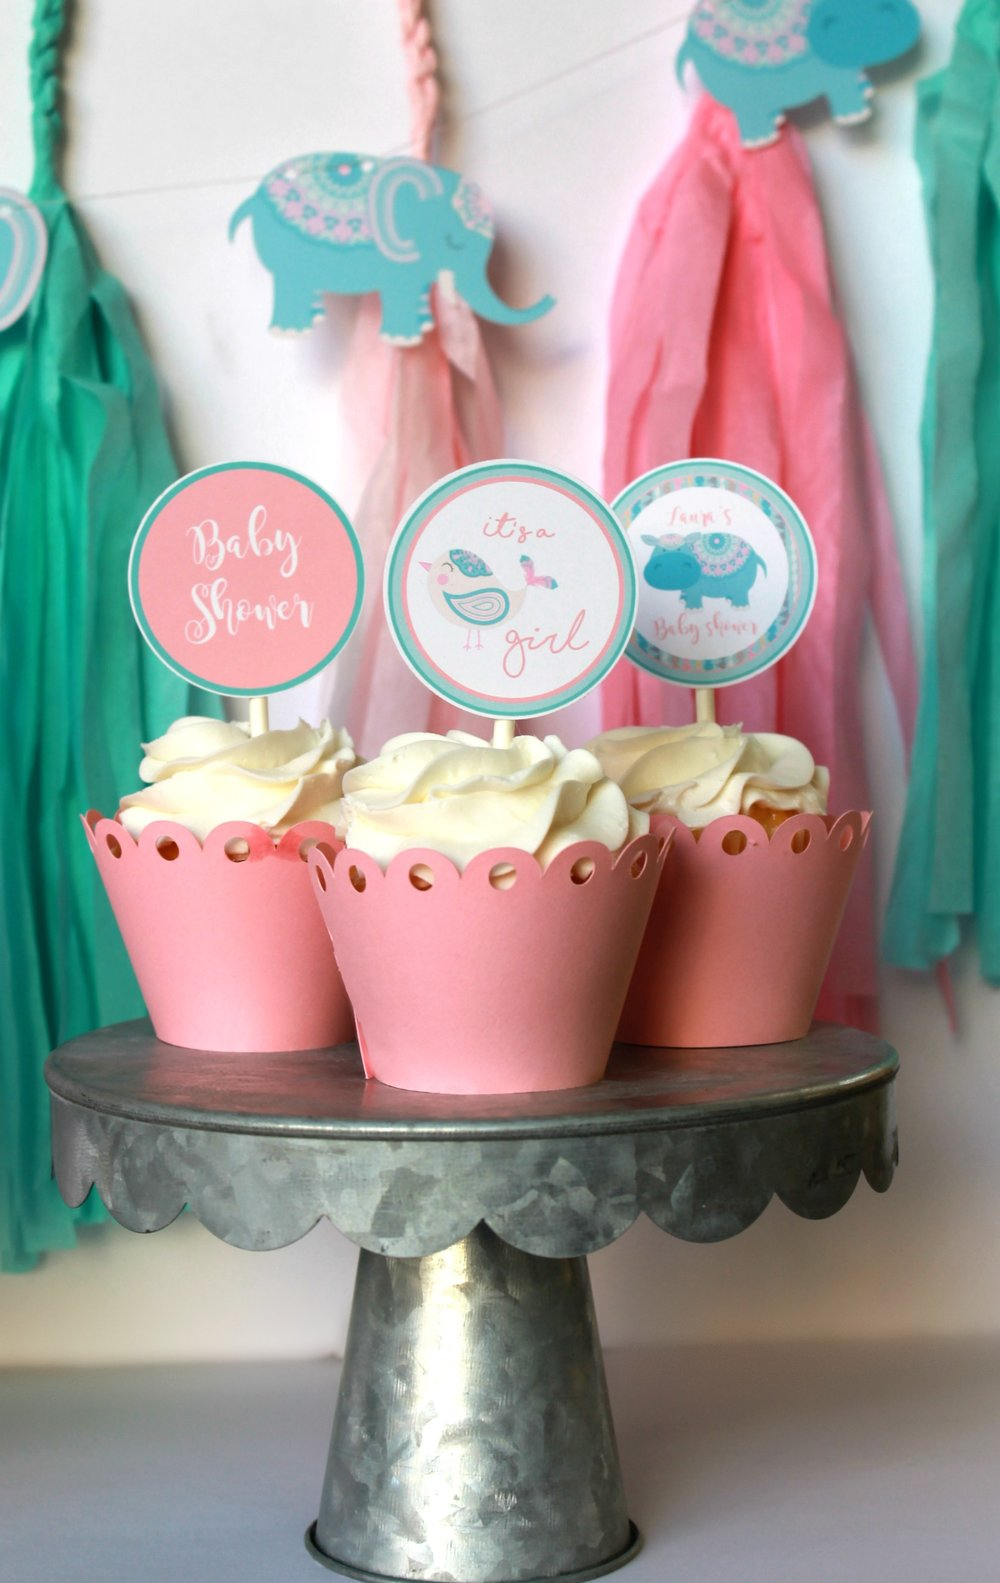 Virtual Baby Shower-It's A girl Cupcake toppers-www.SugarPartiesLA.com.jpg